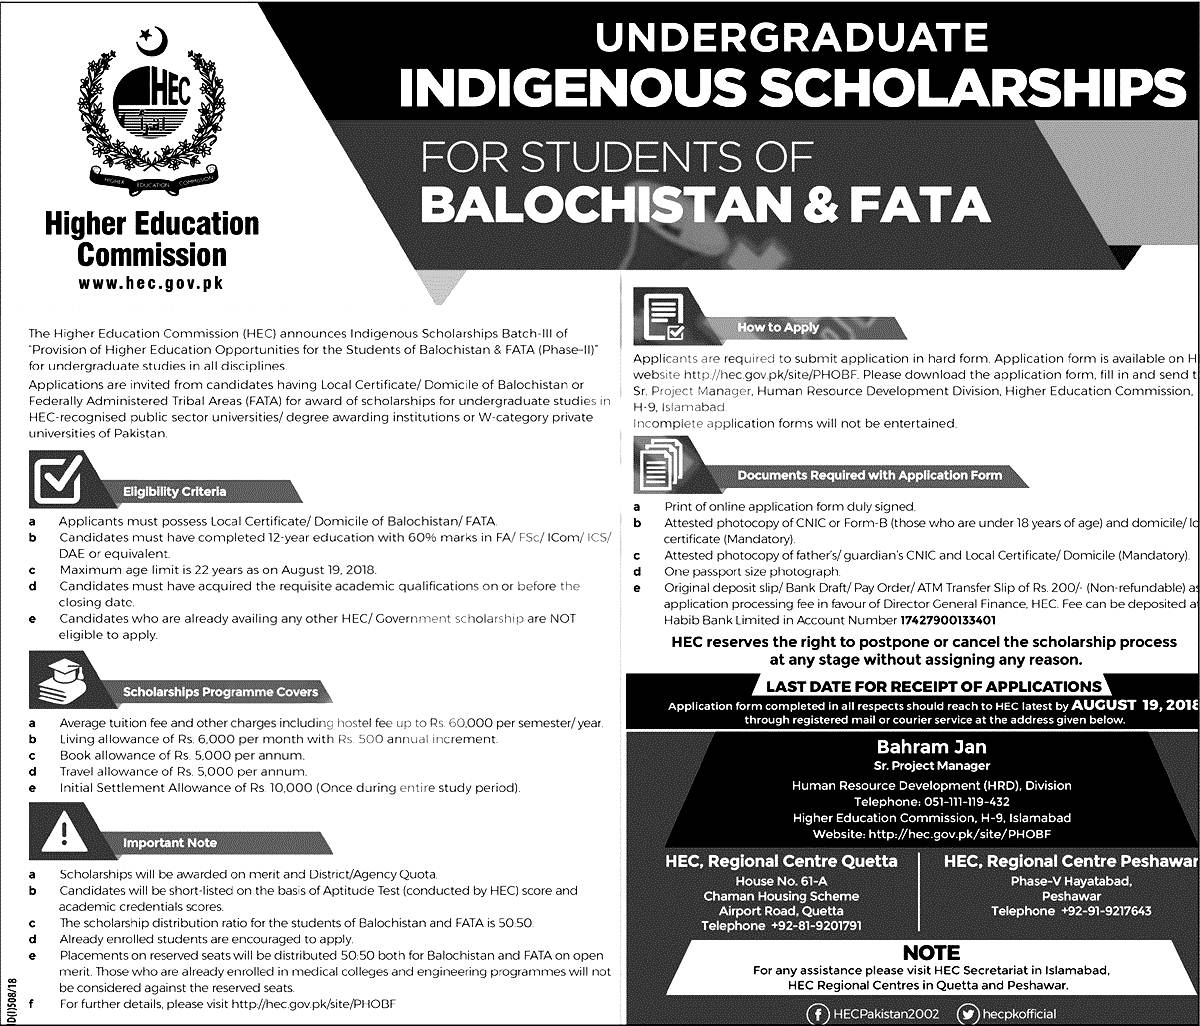 HEC Undergraduate Indigenous Scholarships 2018 Application forms download online